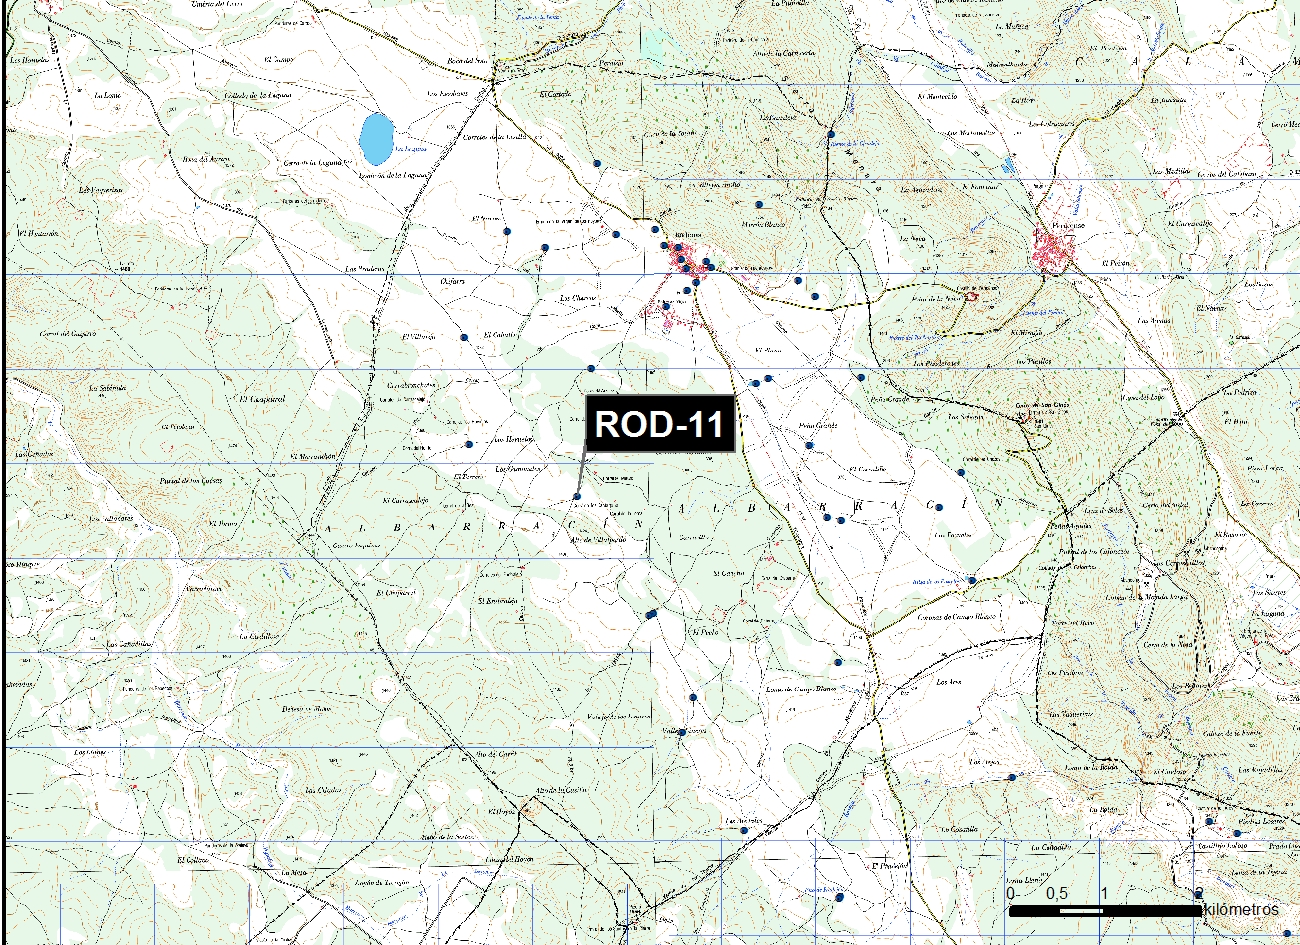 ROD_11_M.V.LOZANO_ POZO VILLARPARDO_MAP.TOPO 1